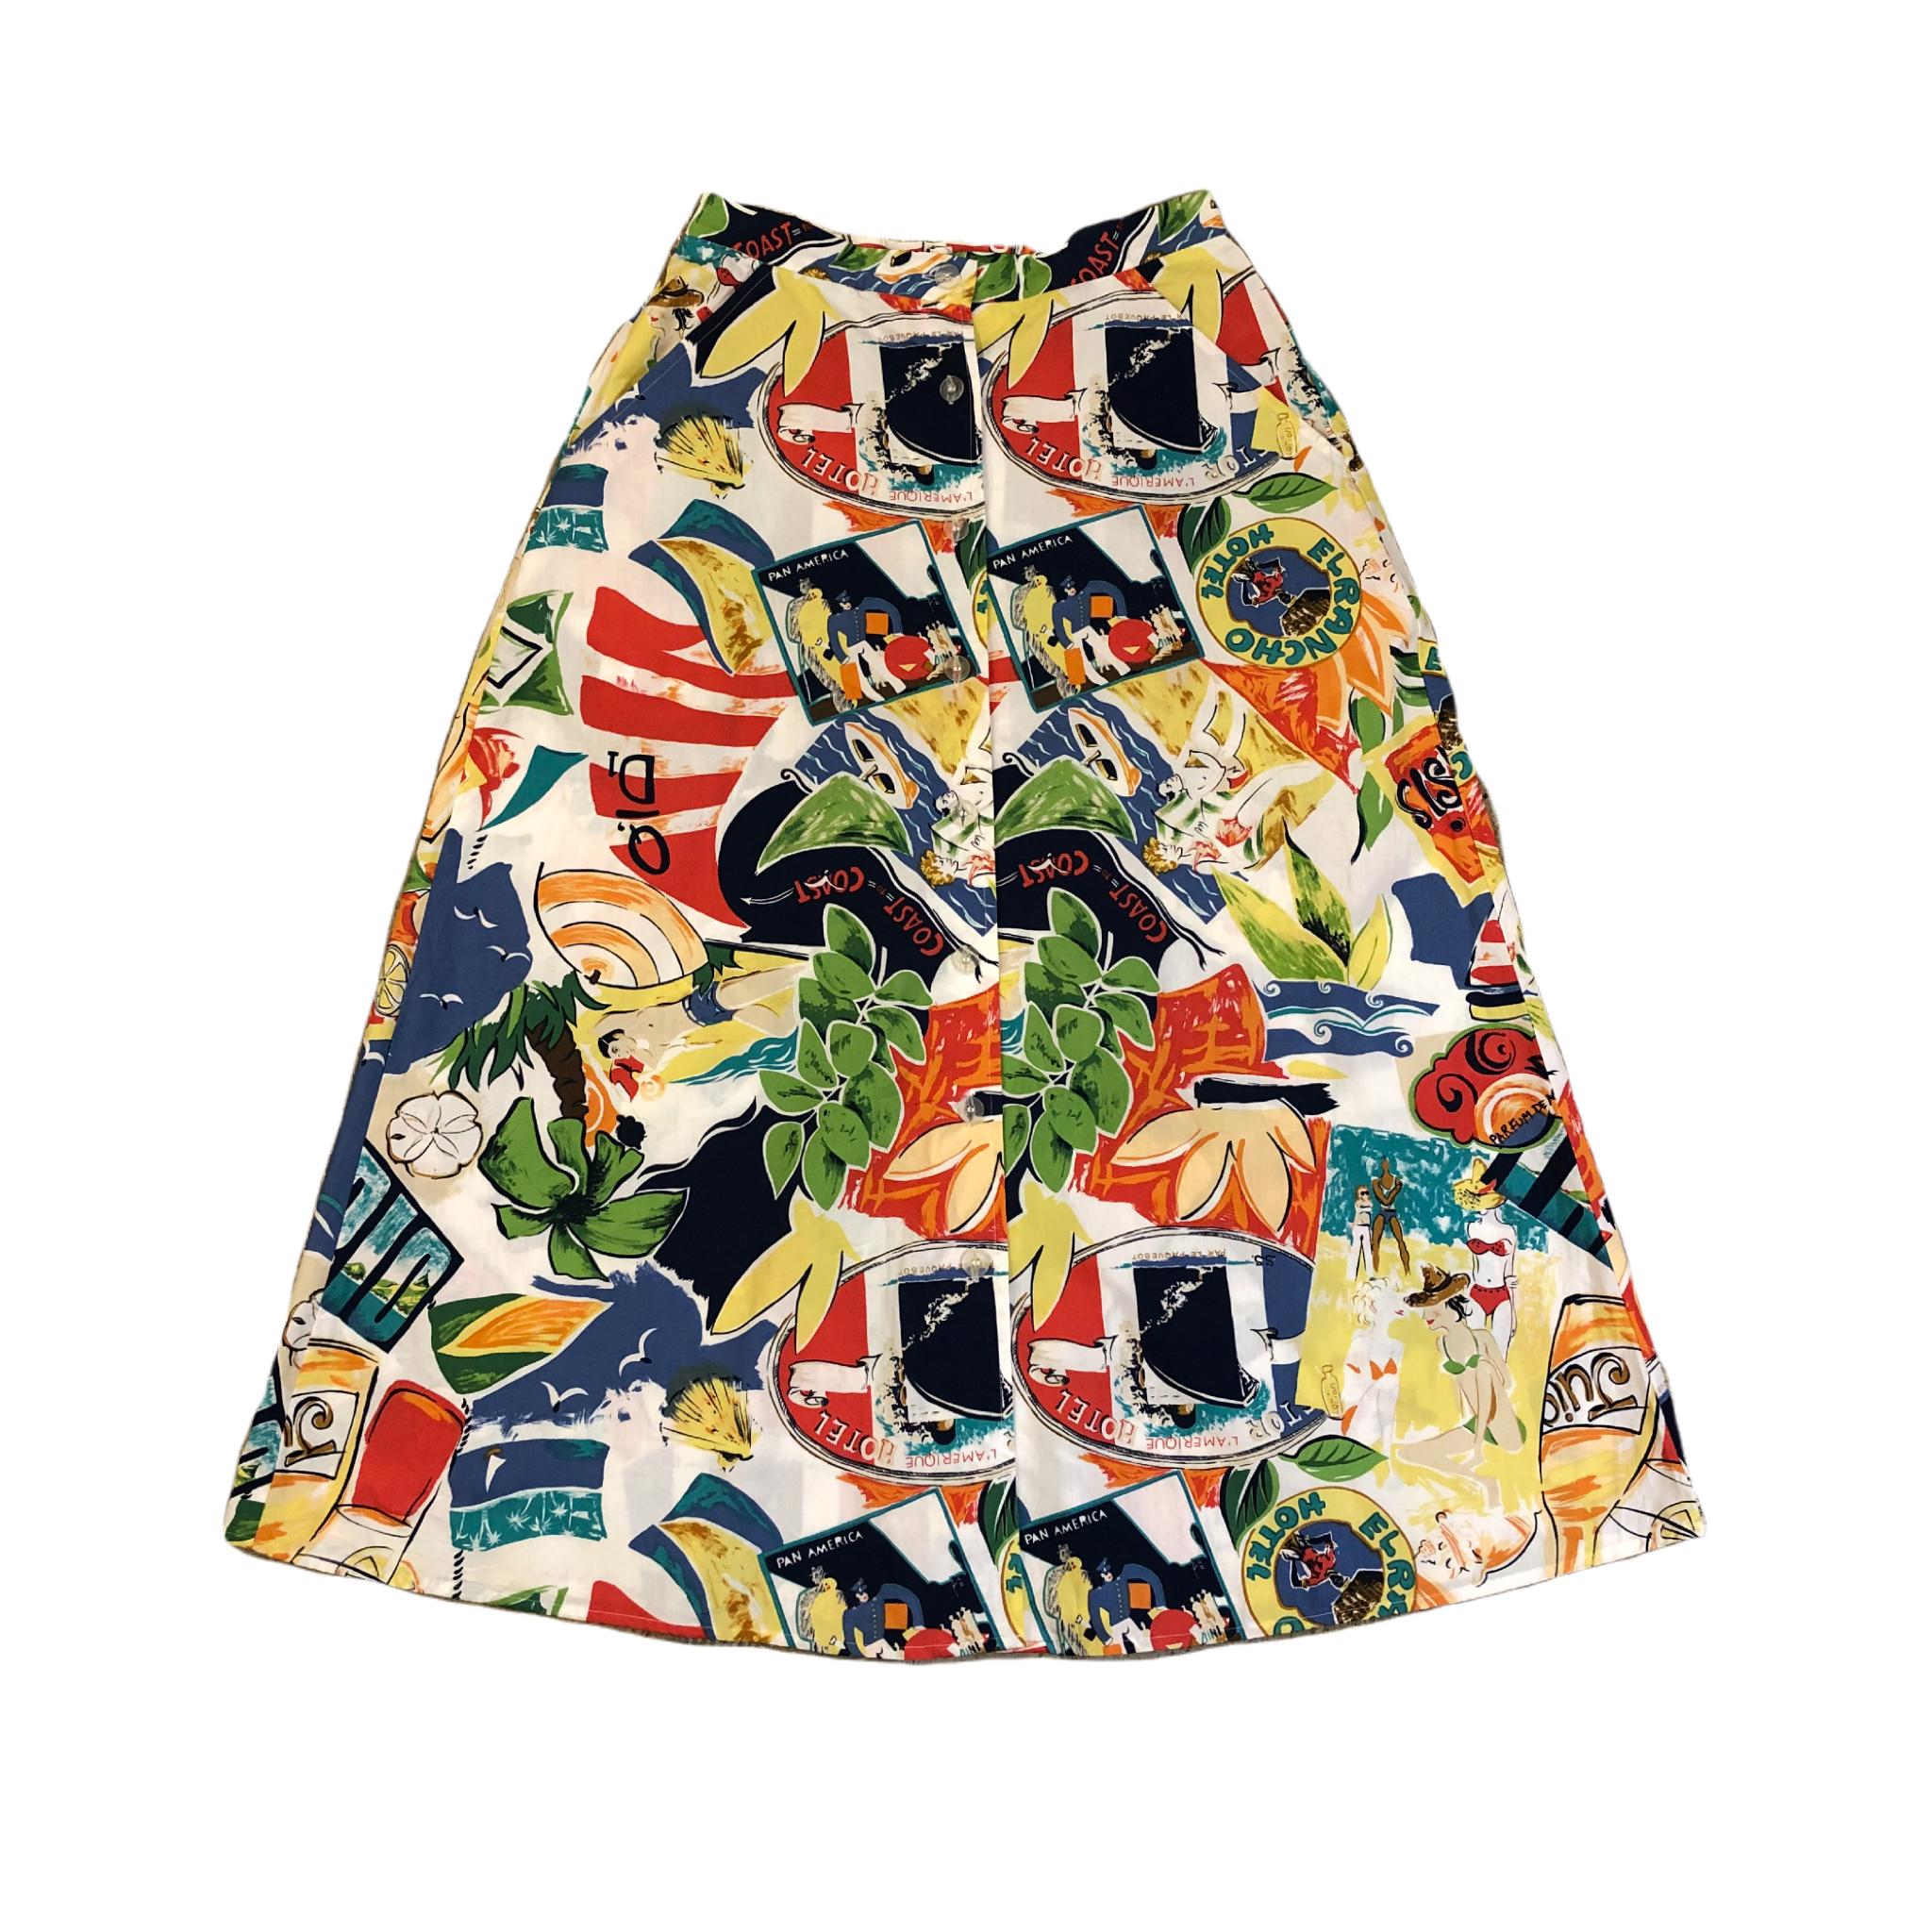 Classics Button Skirt ¥6,200+tax